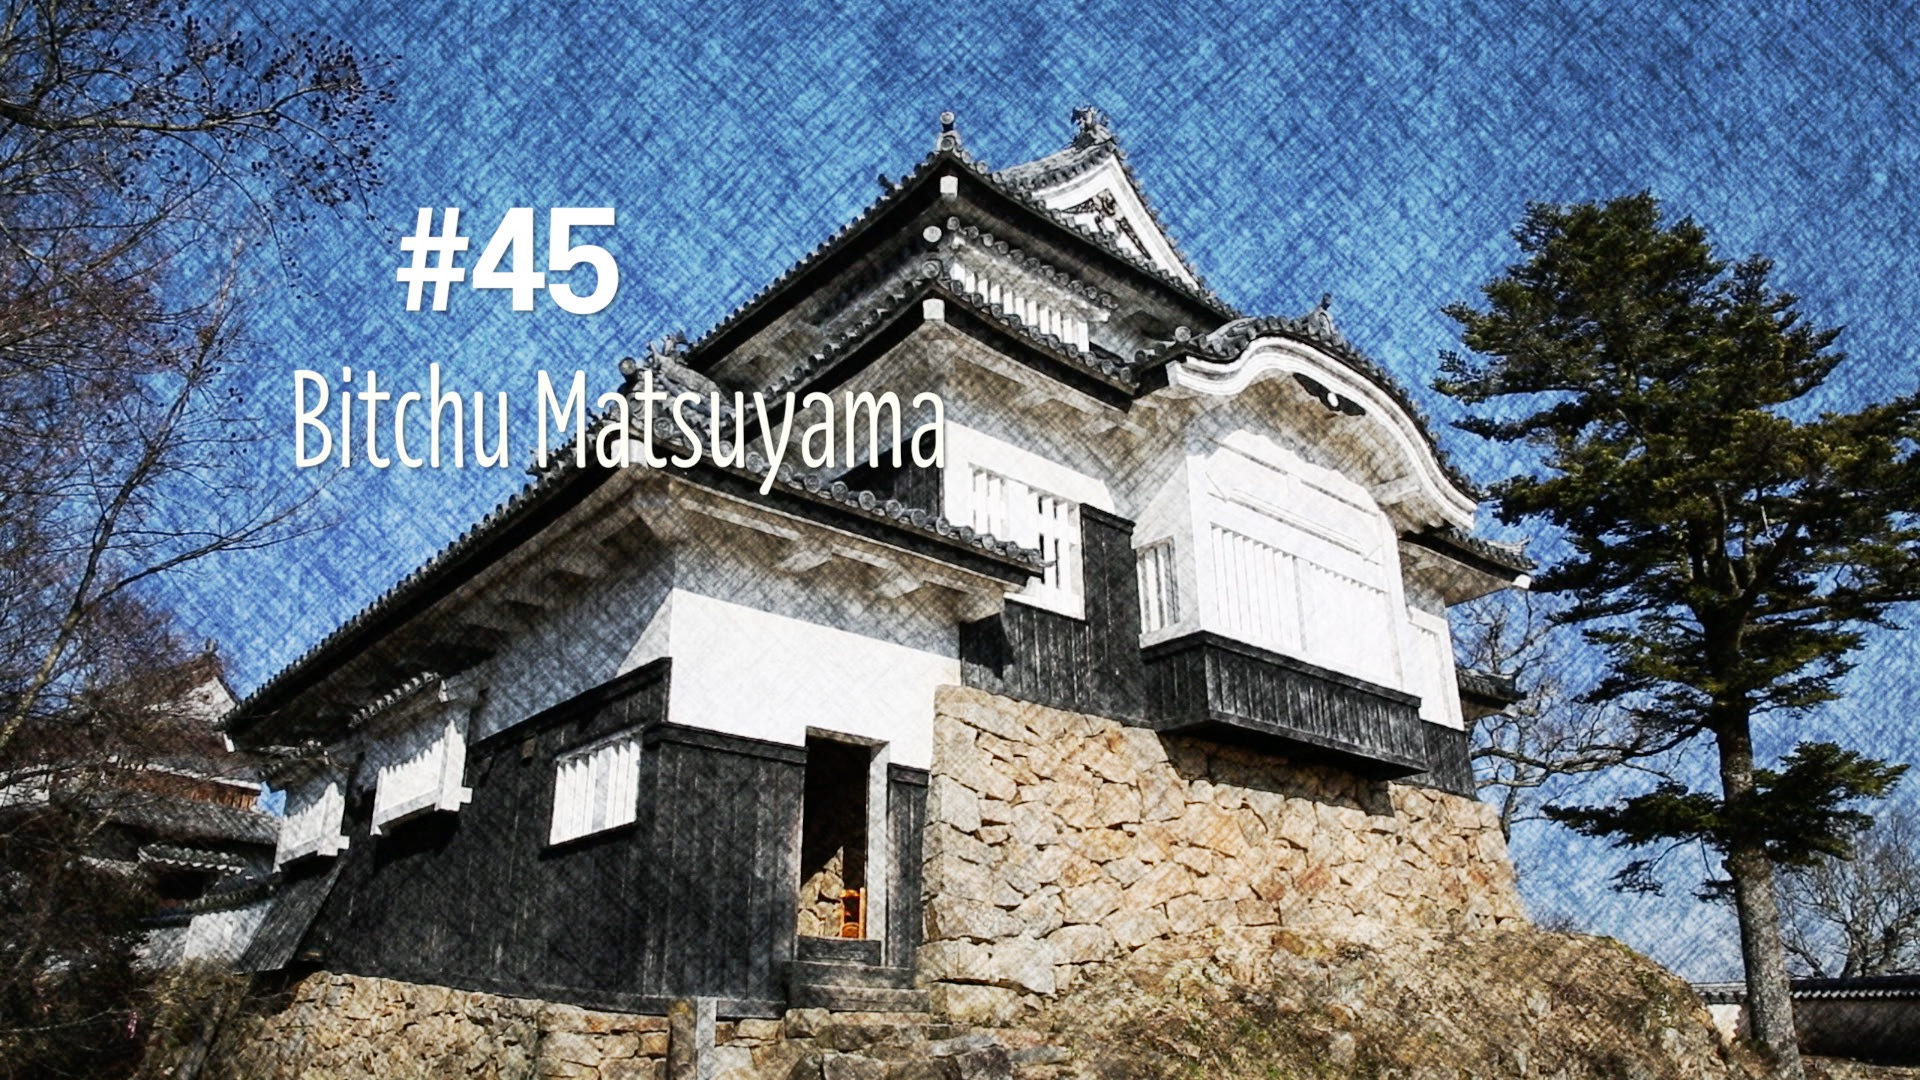 Le château de Bitchu Matsuyama (#45)